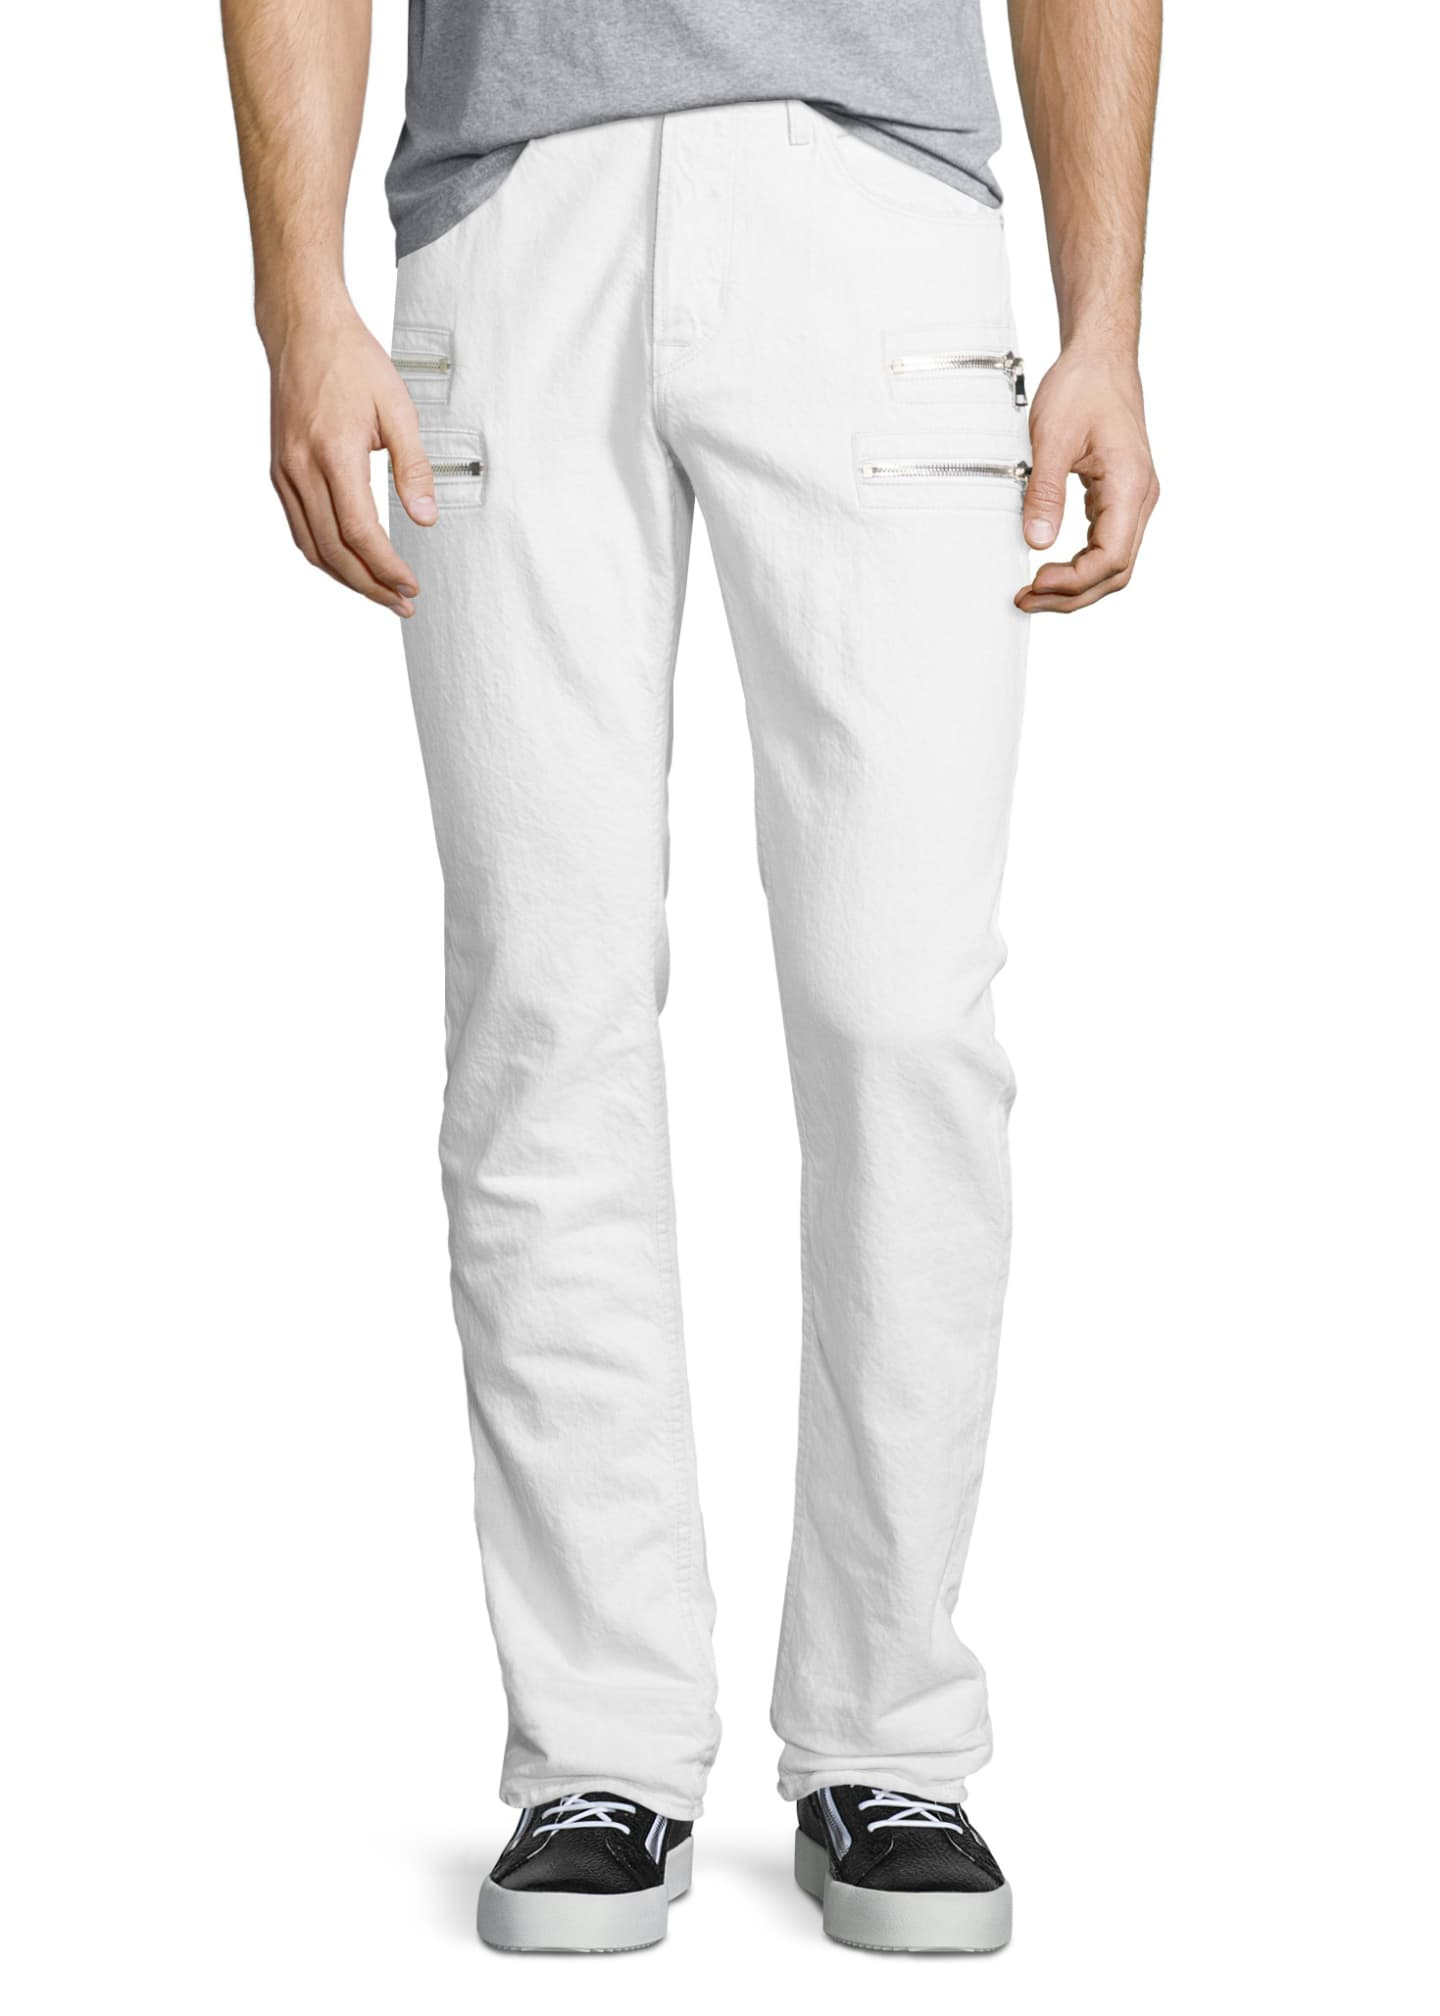 Hudson Broderick Slouchy Skinny Jeans, Beige/White